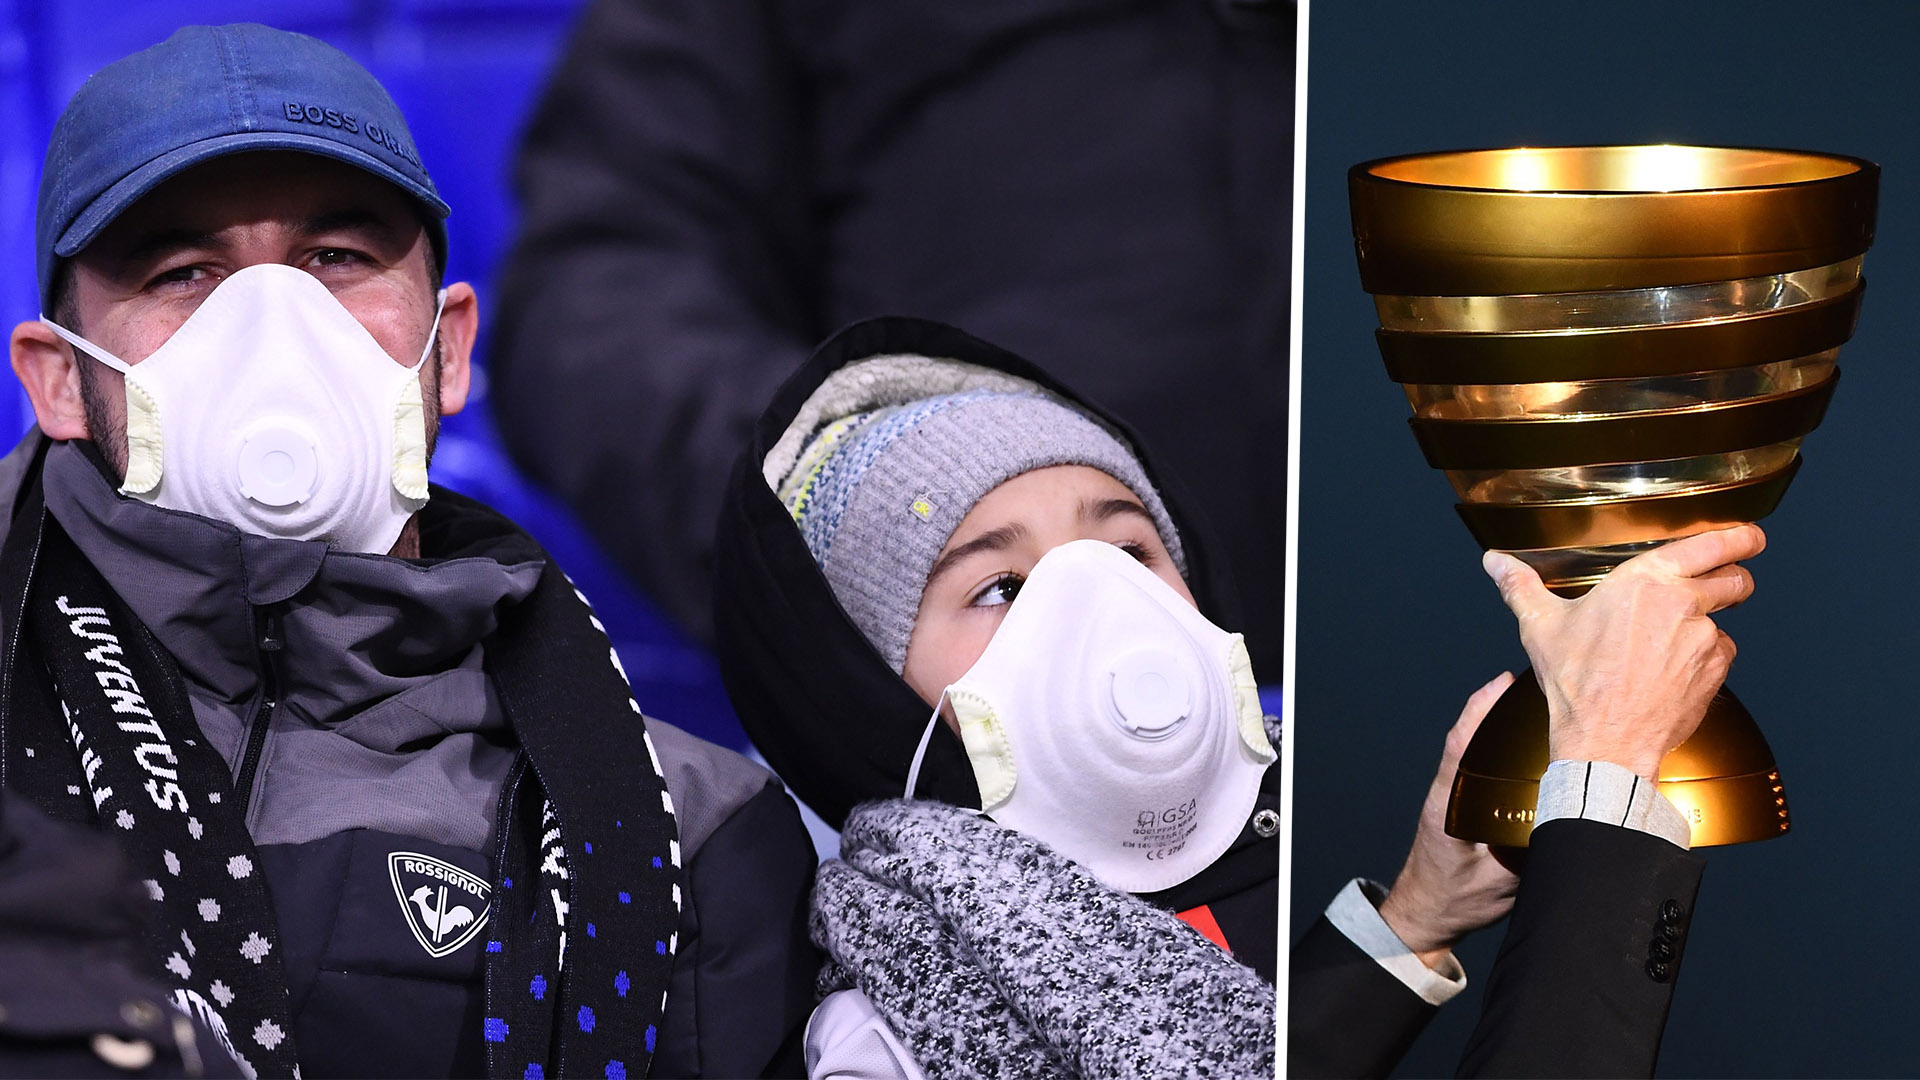 Coronavirus: Coupe de la Ligue final between PSG & Lyon postponed